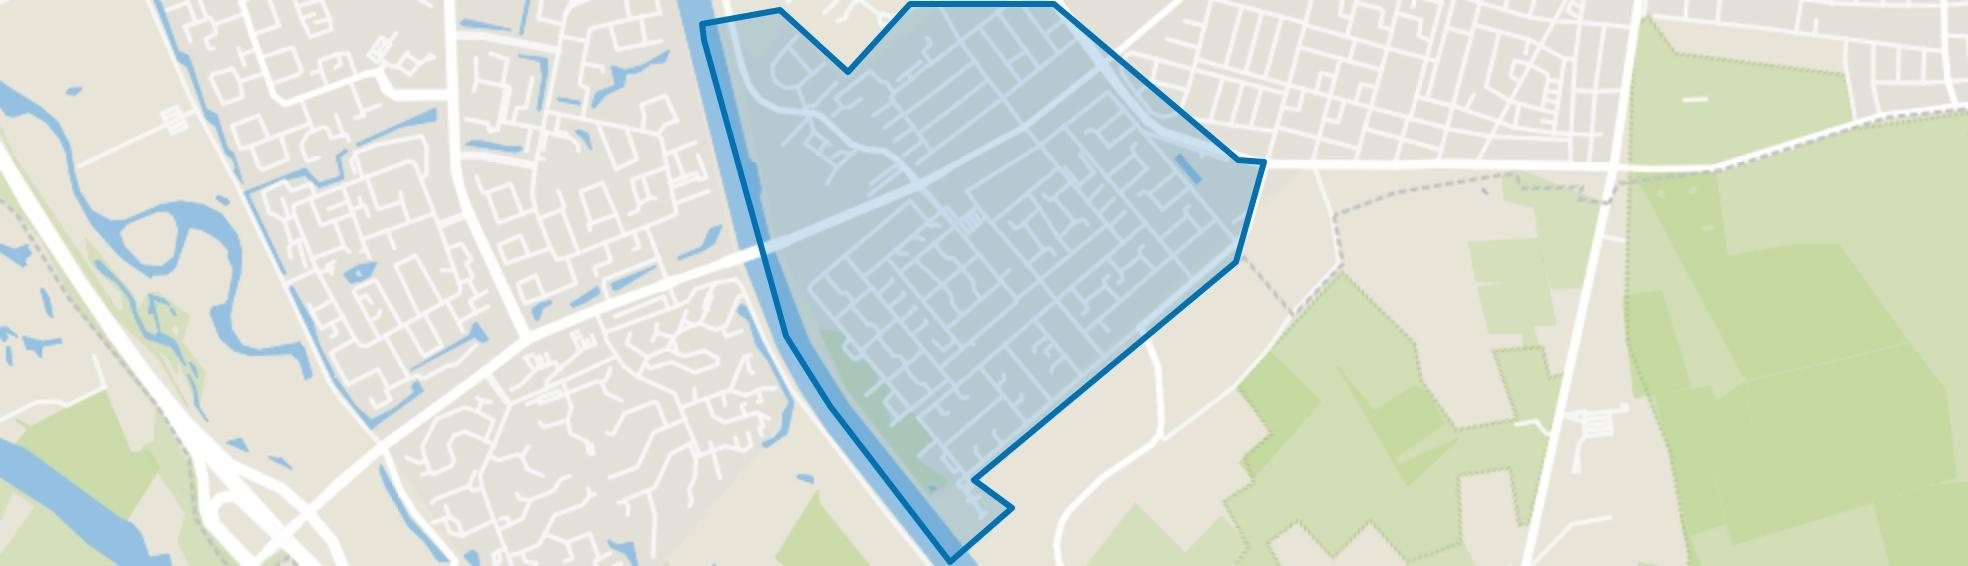 Hatert, Nijmegen map